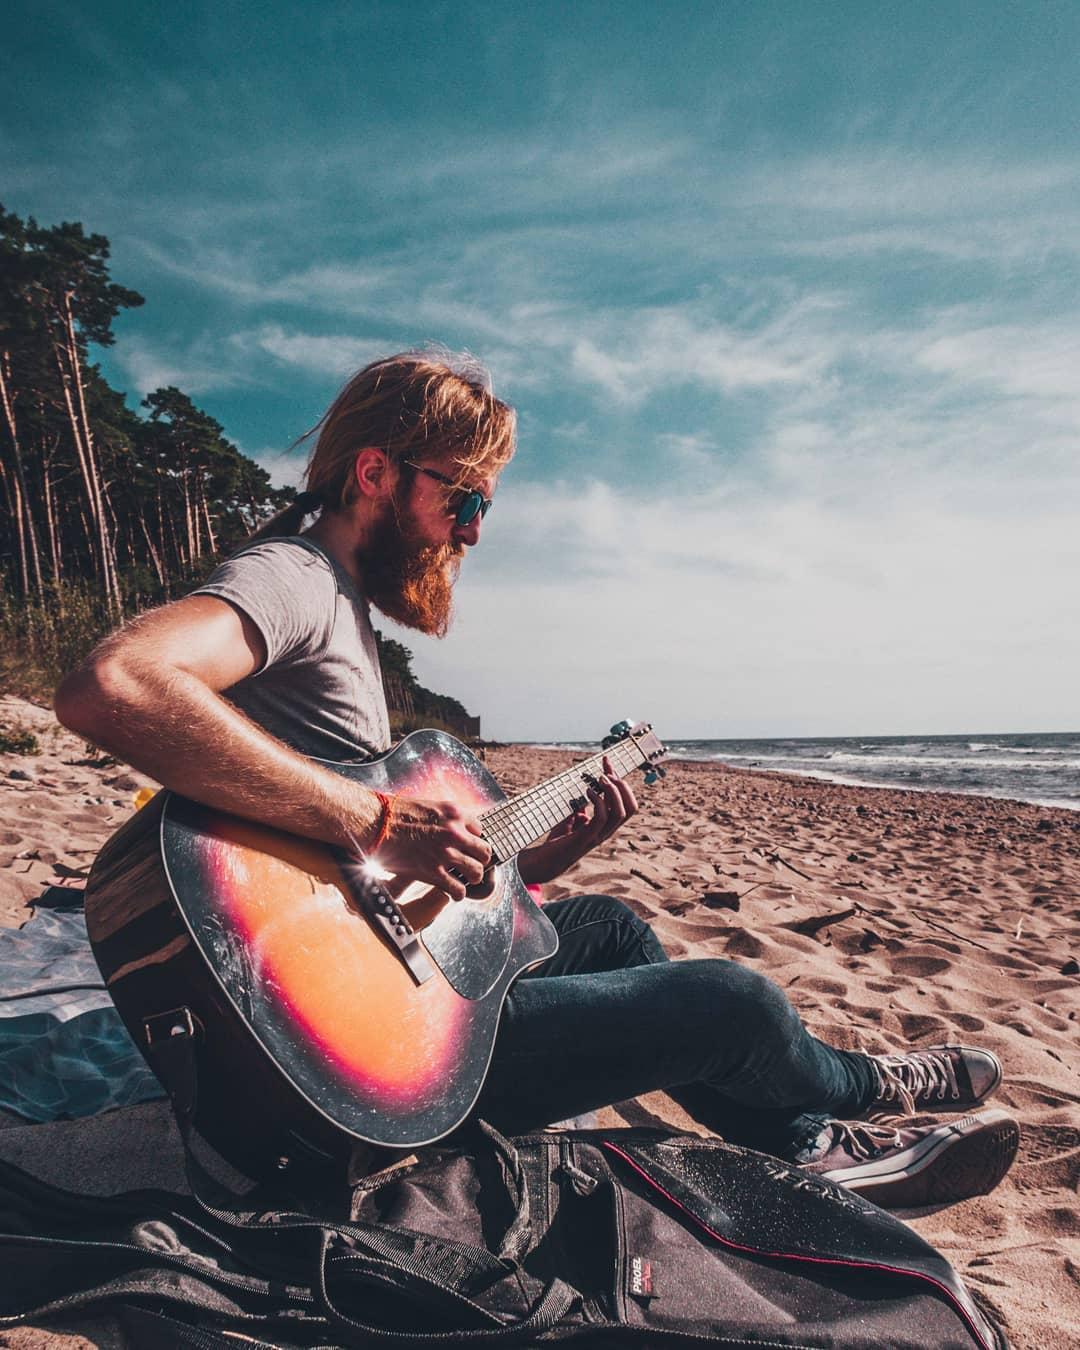 Eduard Banulescu playing guitar on the beach